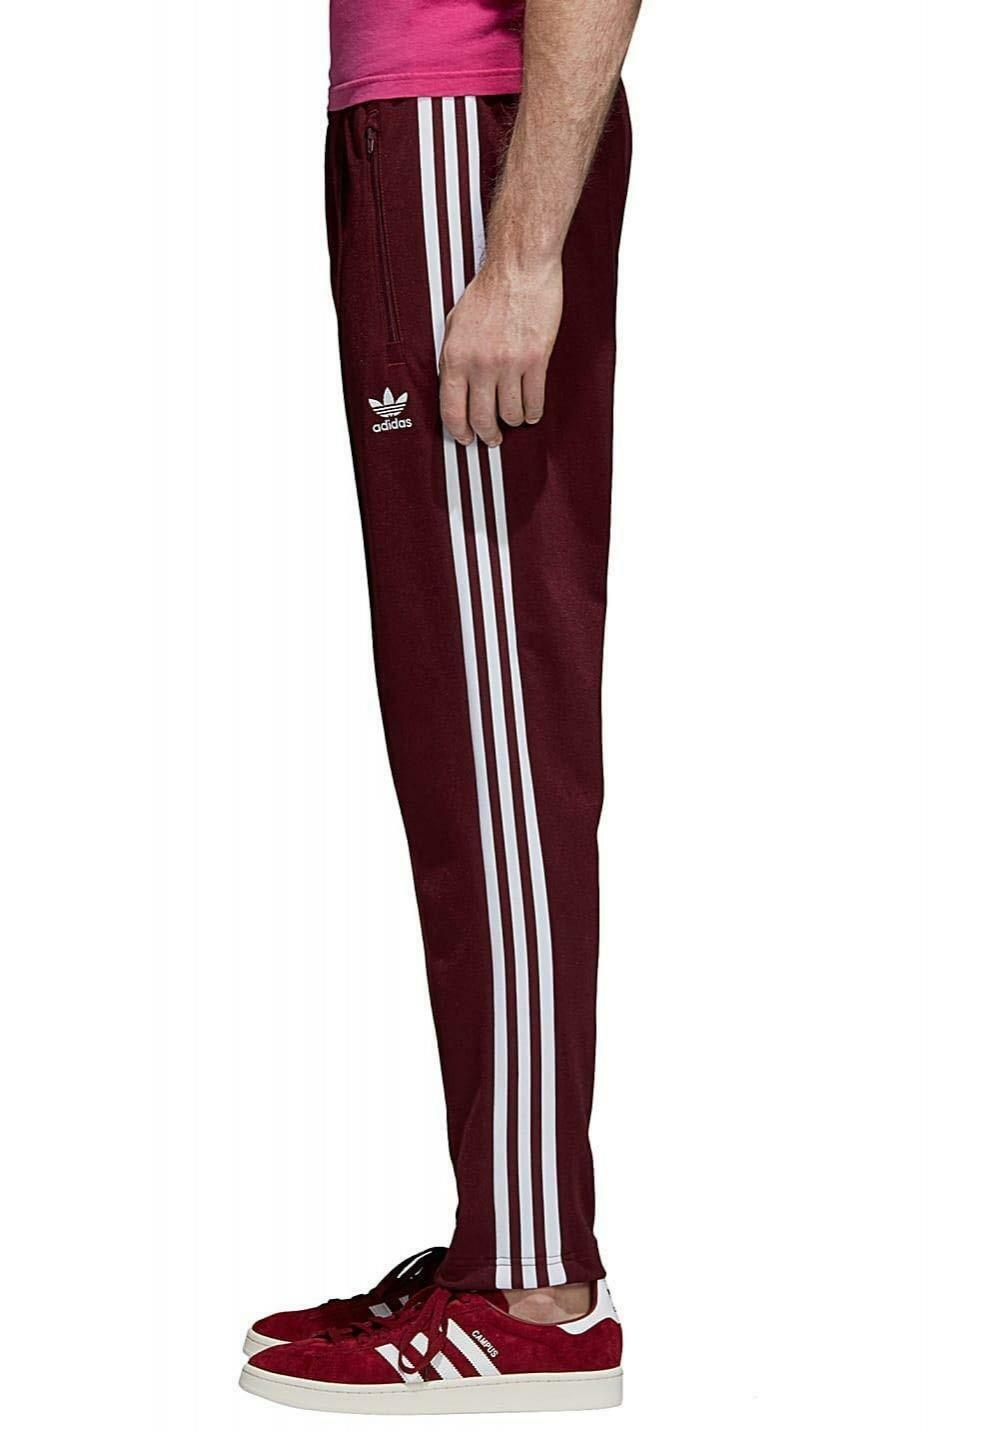 adidas pantaloni beckenbauer uomo